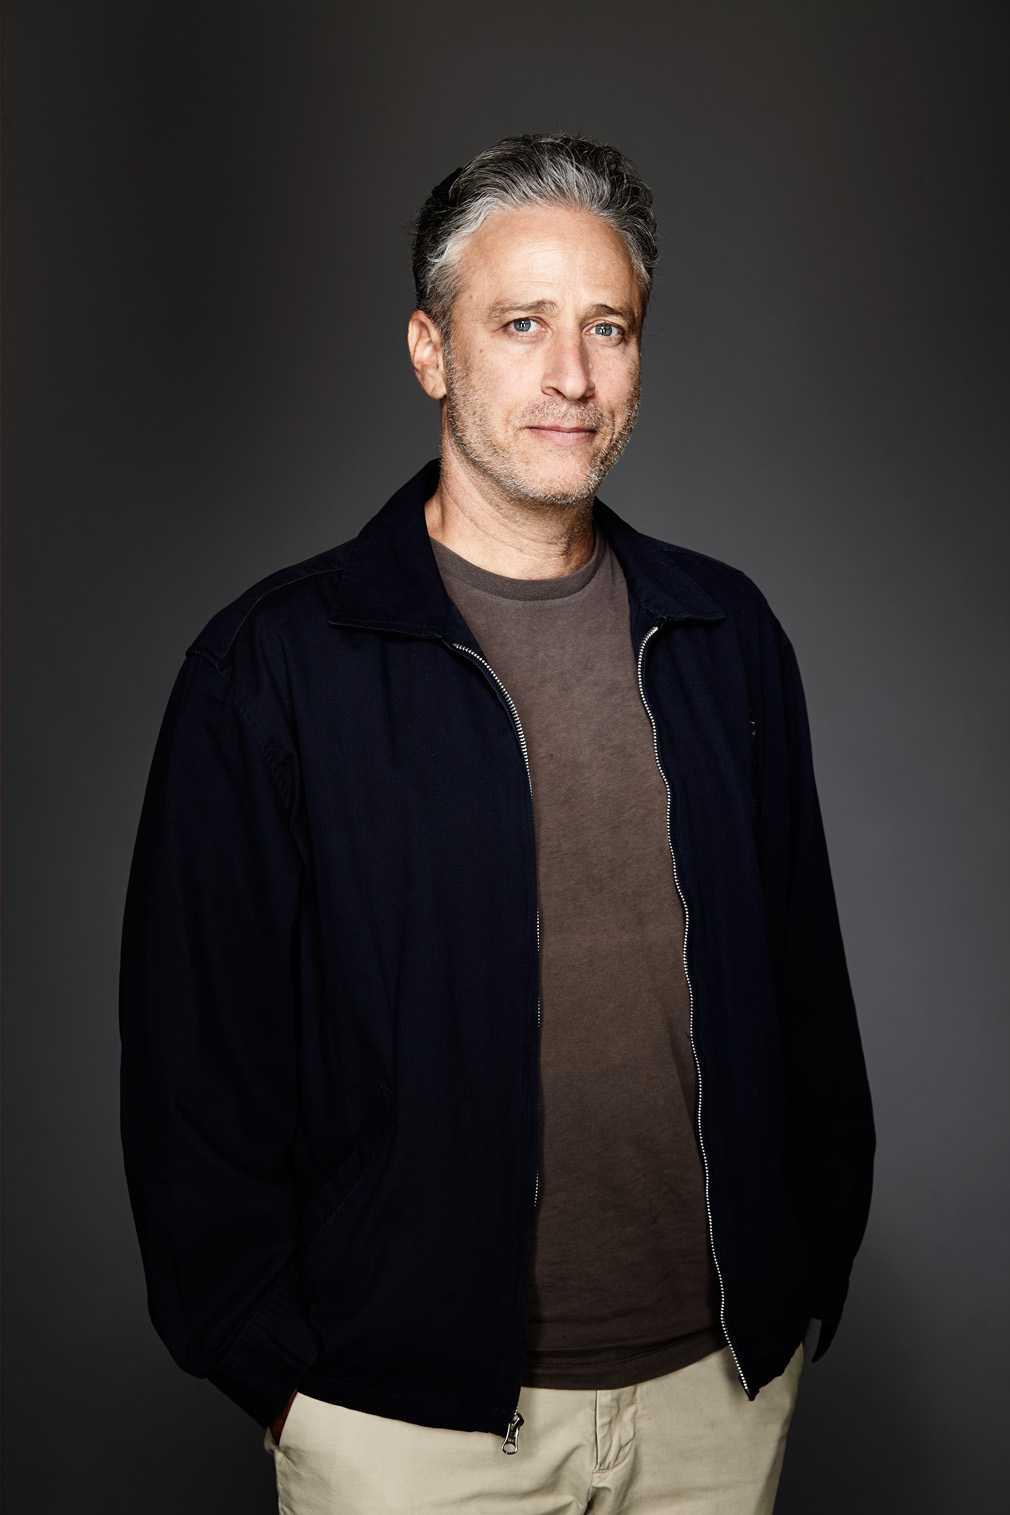 Jon Stewart And Wife Turn Farm Into Animal Sanctuary | Jon Stewart